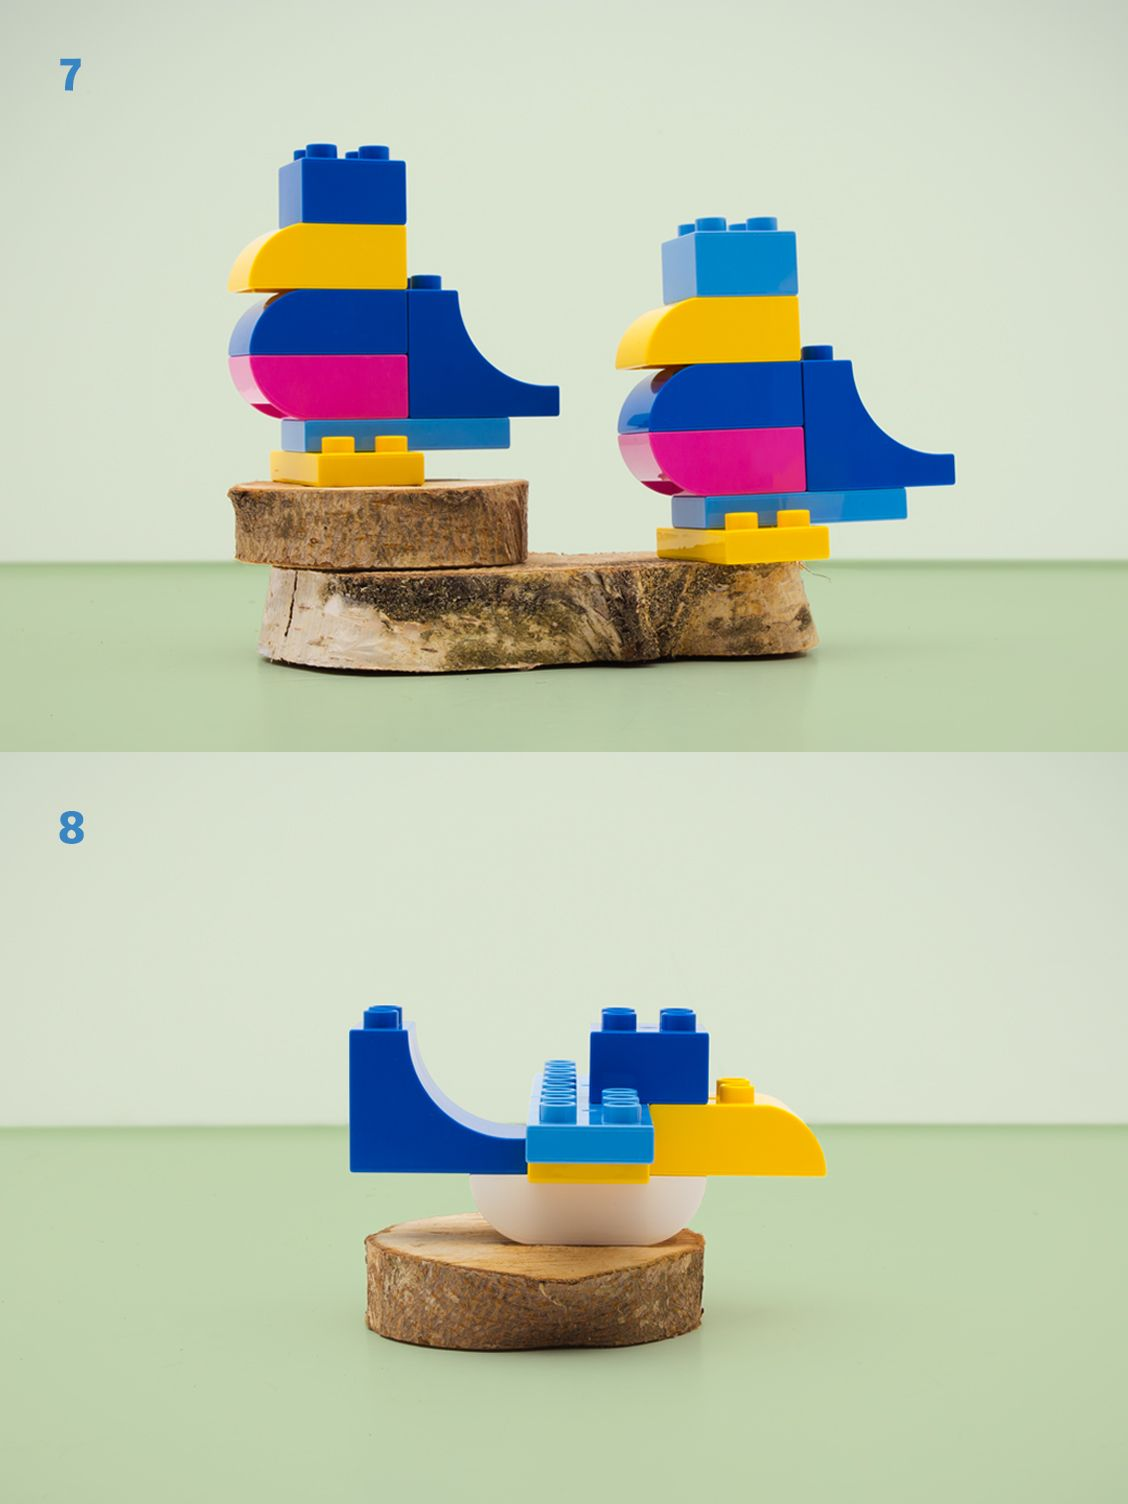 Fun bird building ideas using only 19 lego duplo bricks for the love of lego lego duplo - Adventskalender duplo ...